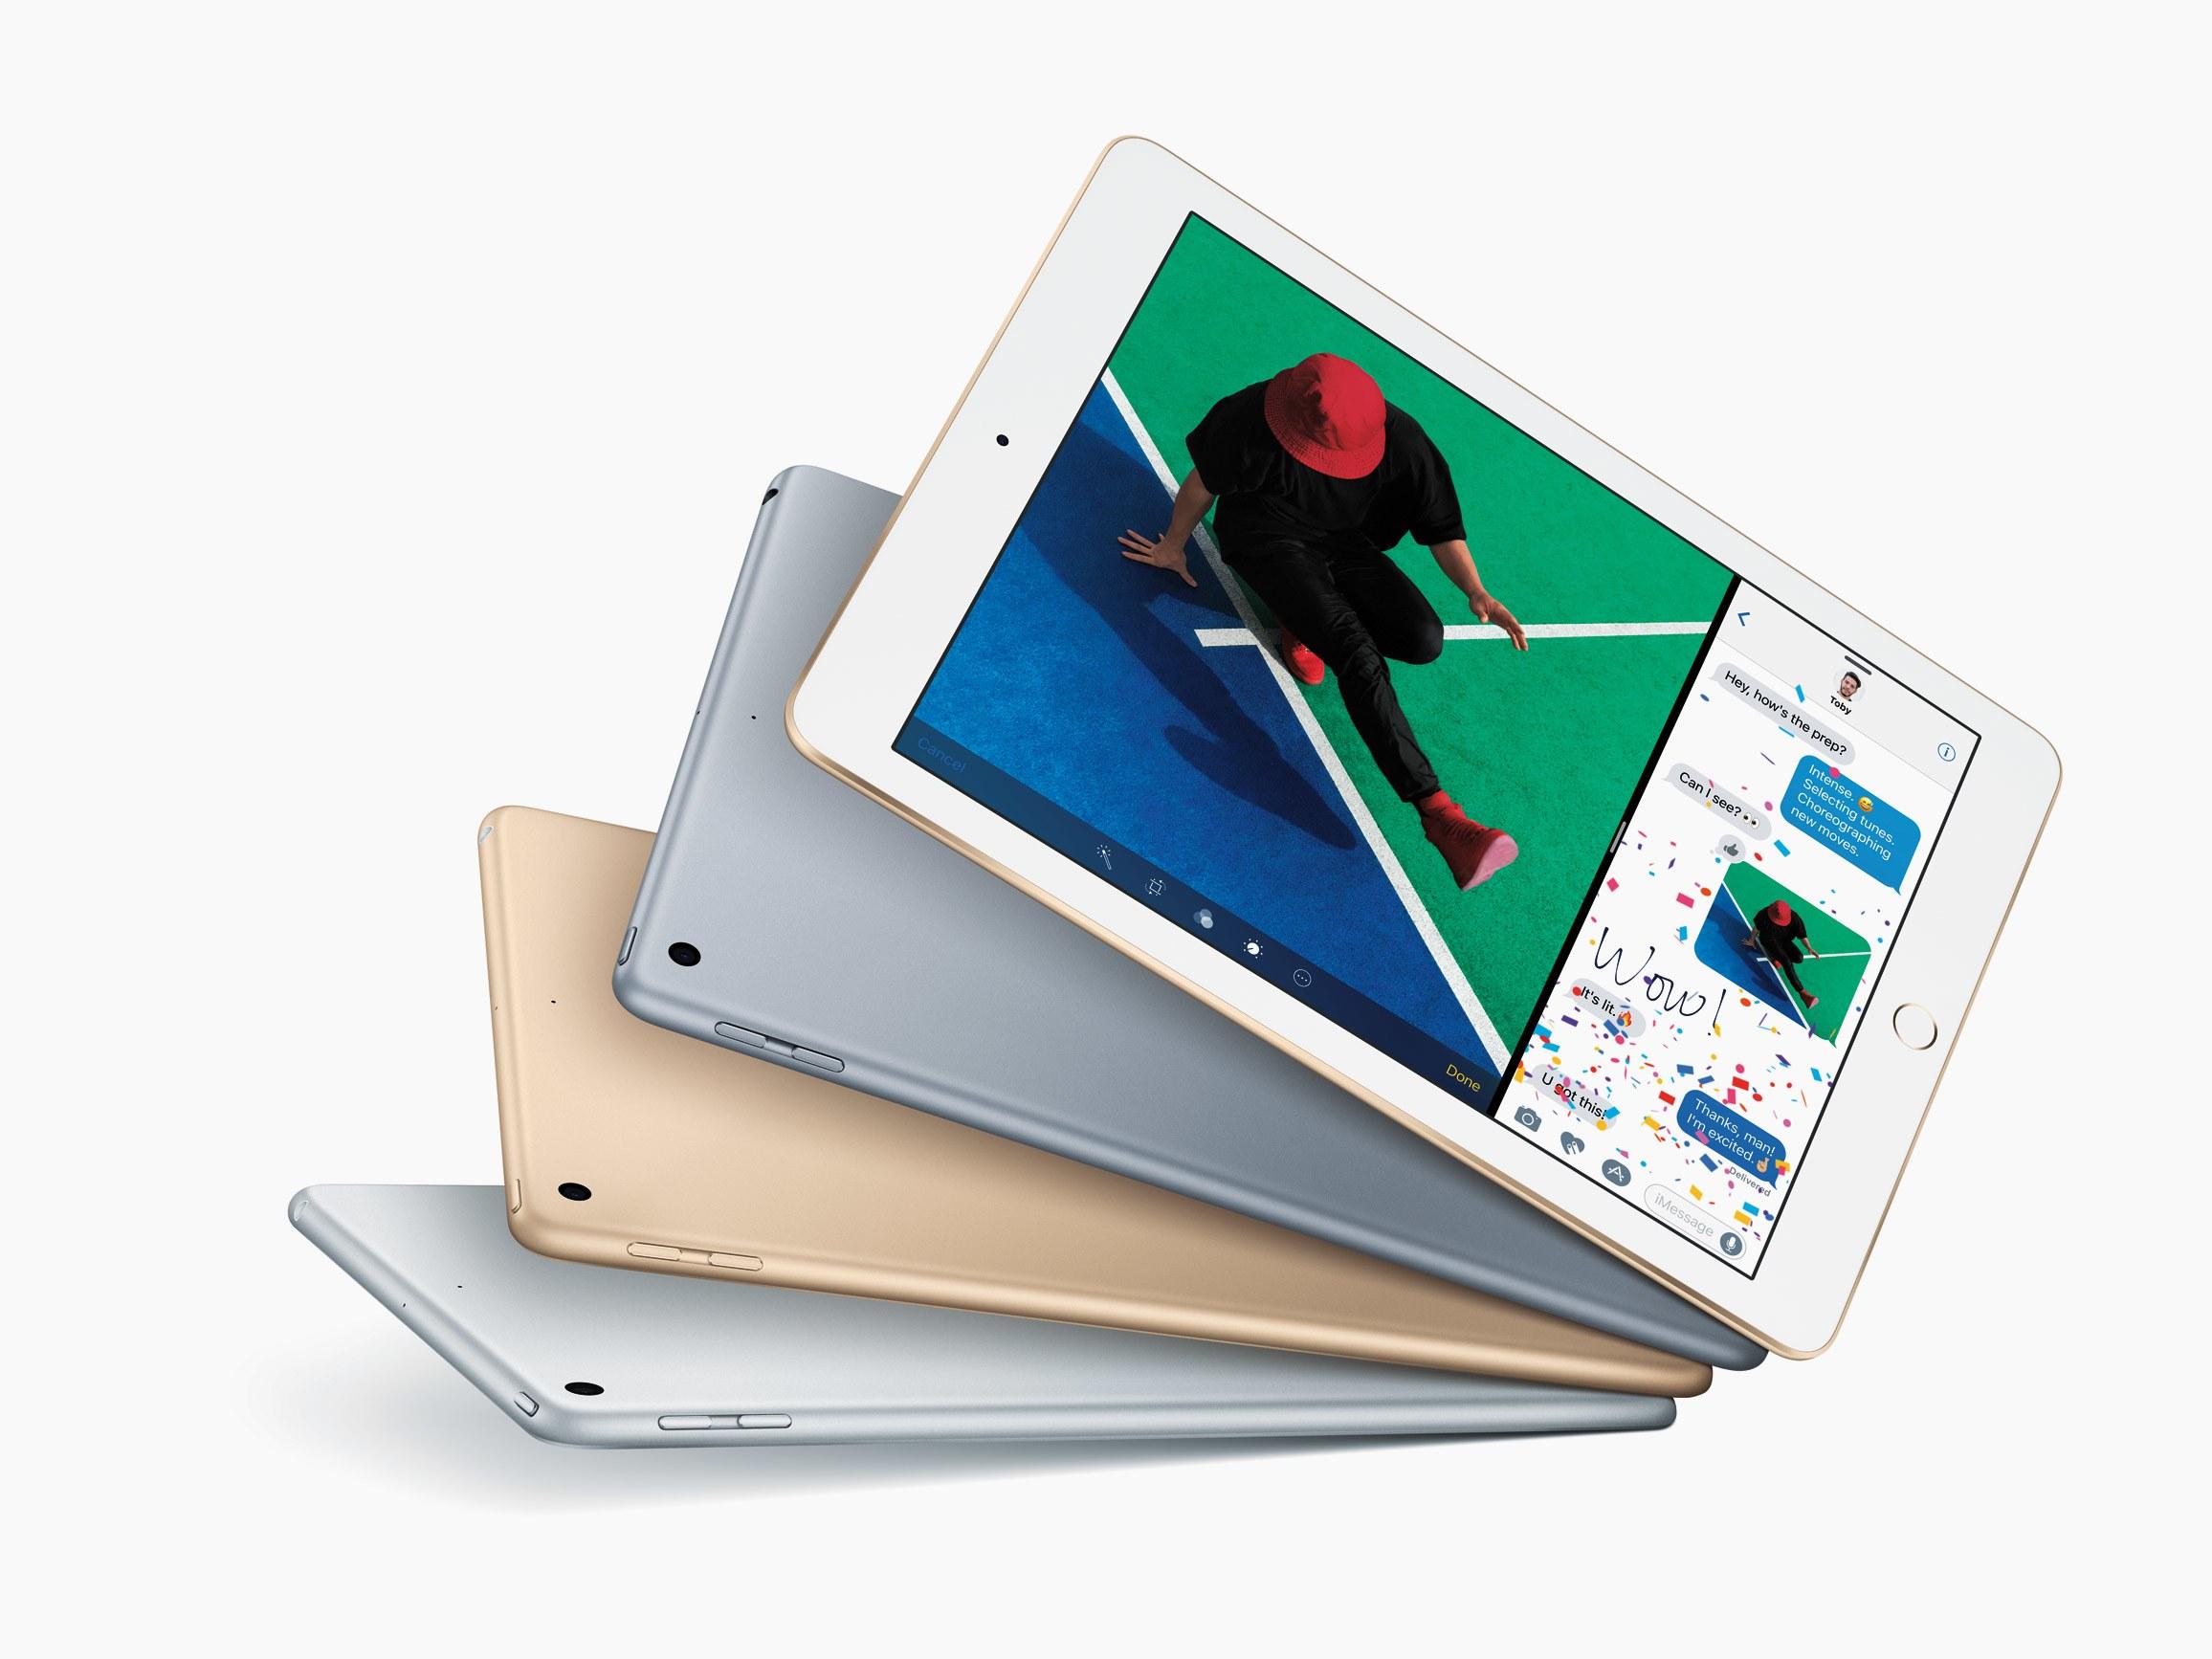 The cheapest iPad